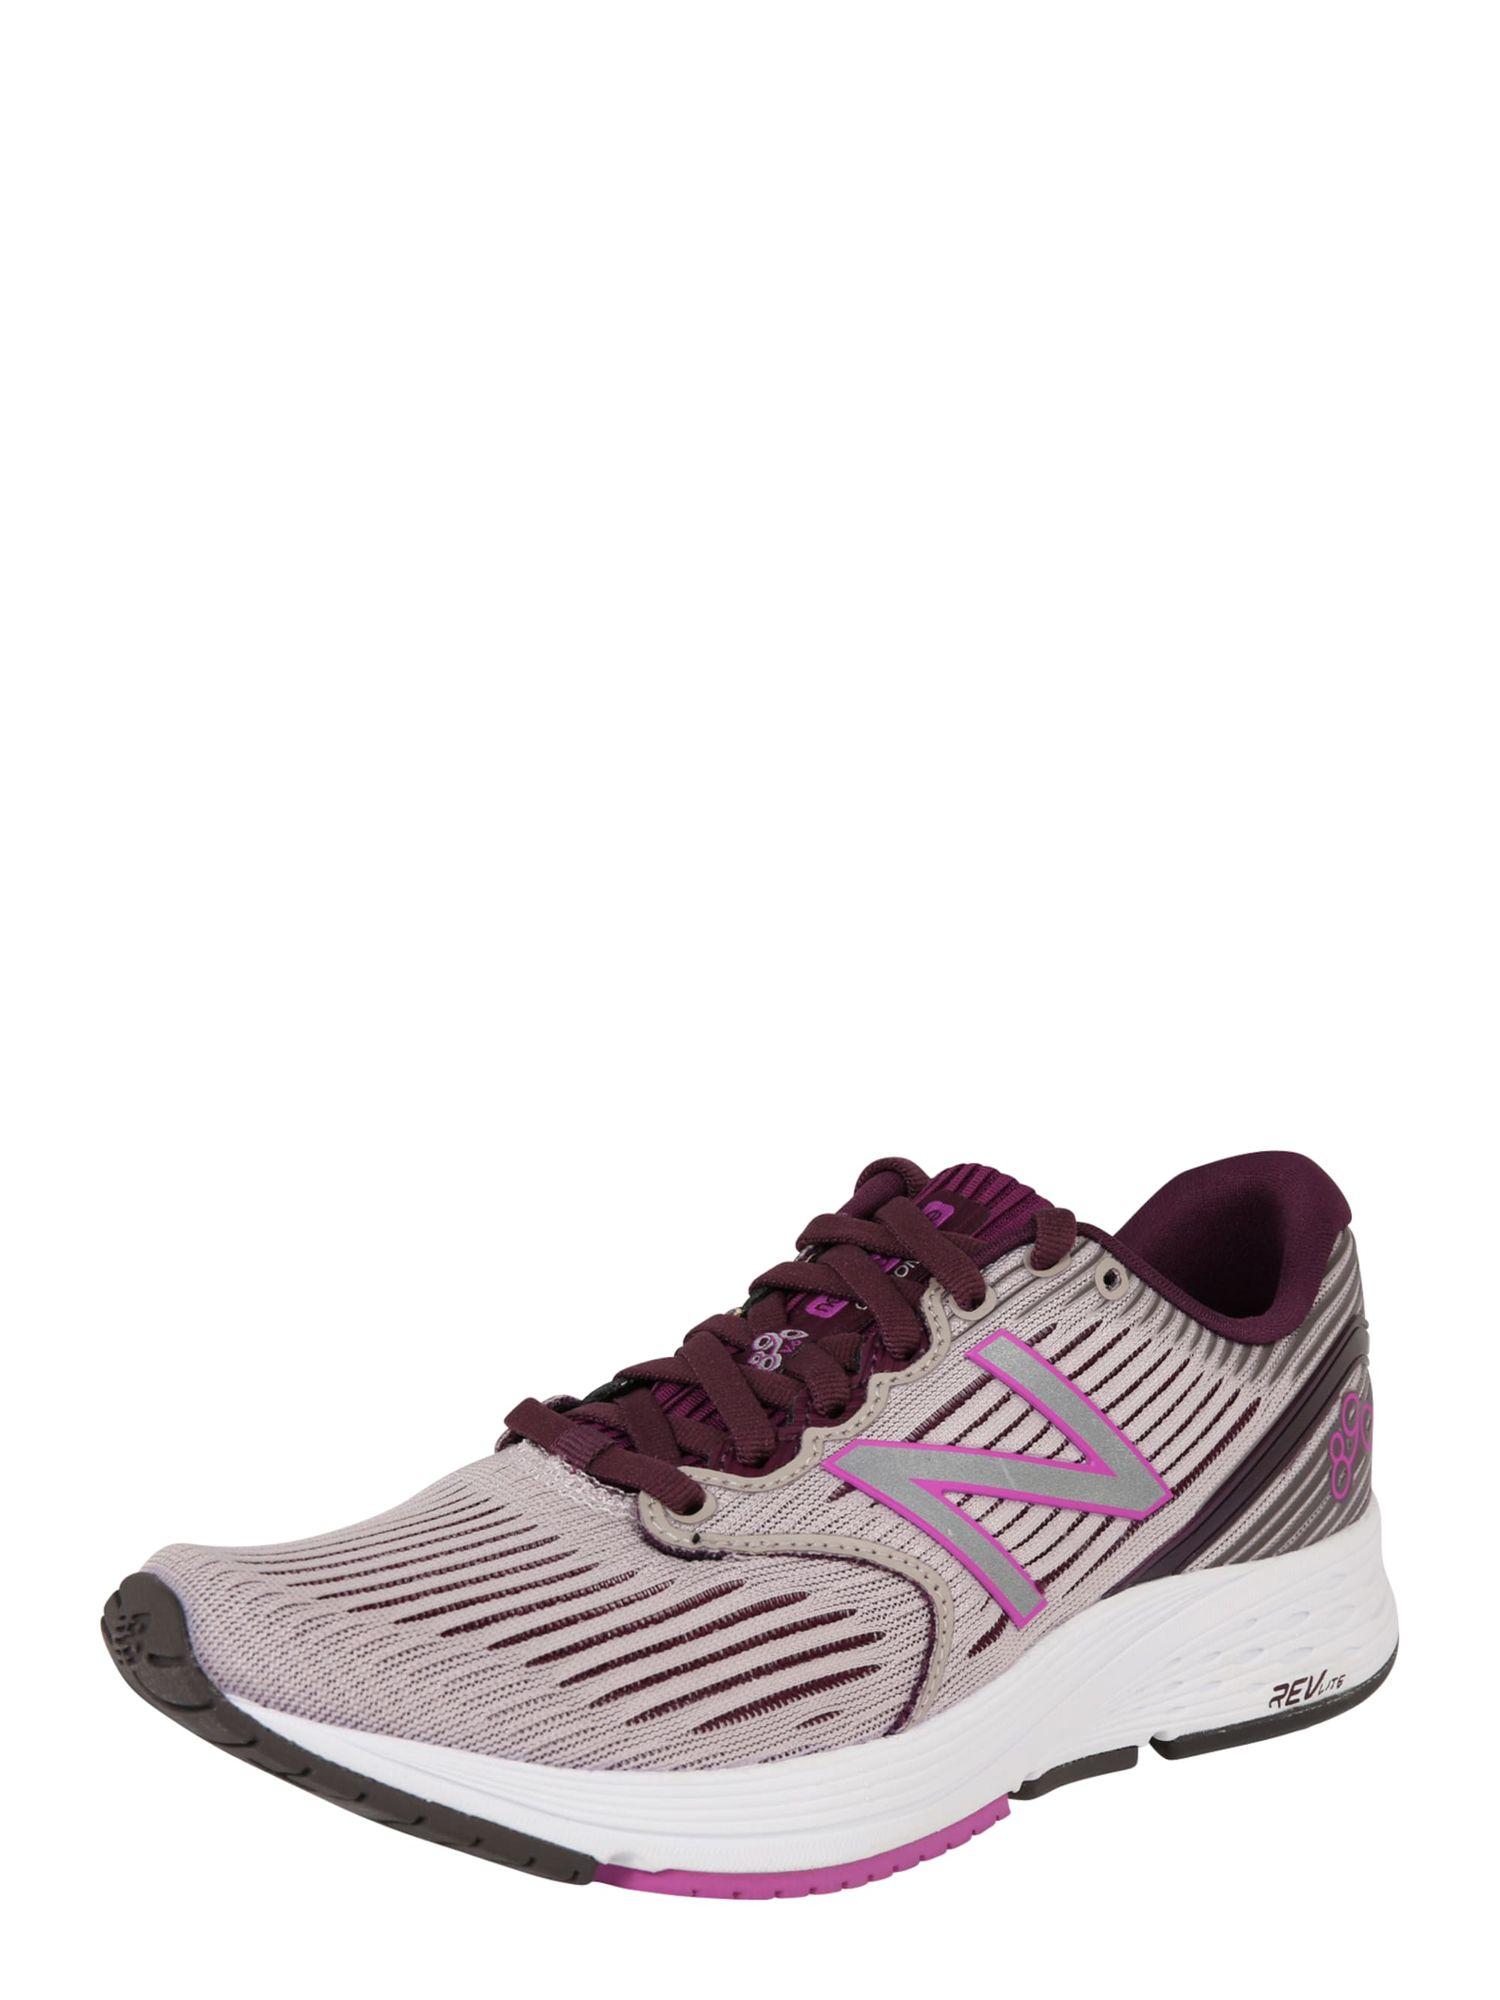 Sport-Schuhe ´W890LC6´